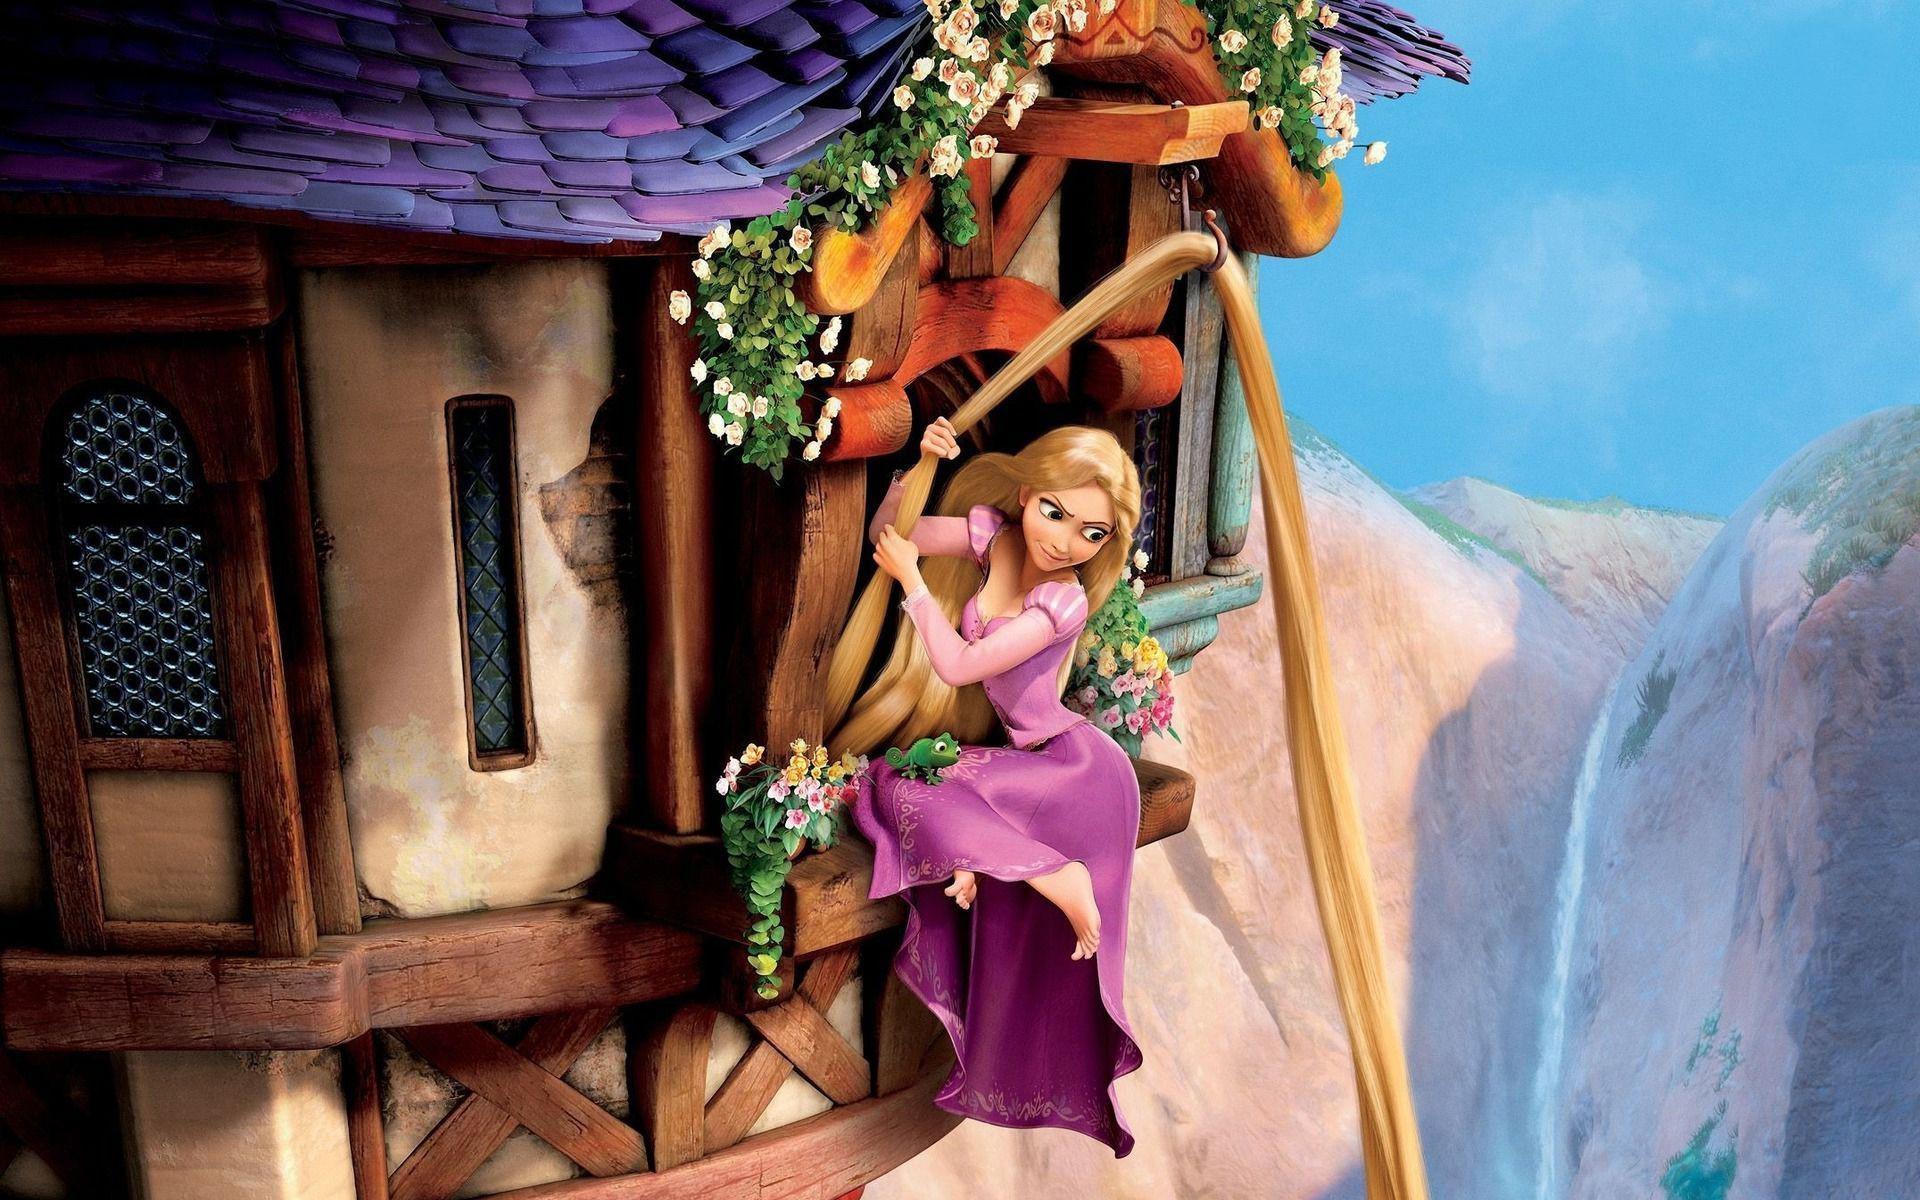 10 Tangled Rapunzel wallpapers hd for desktop